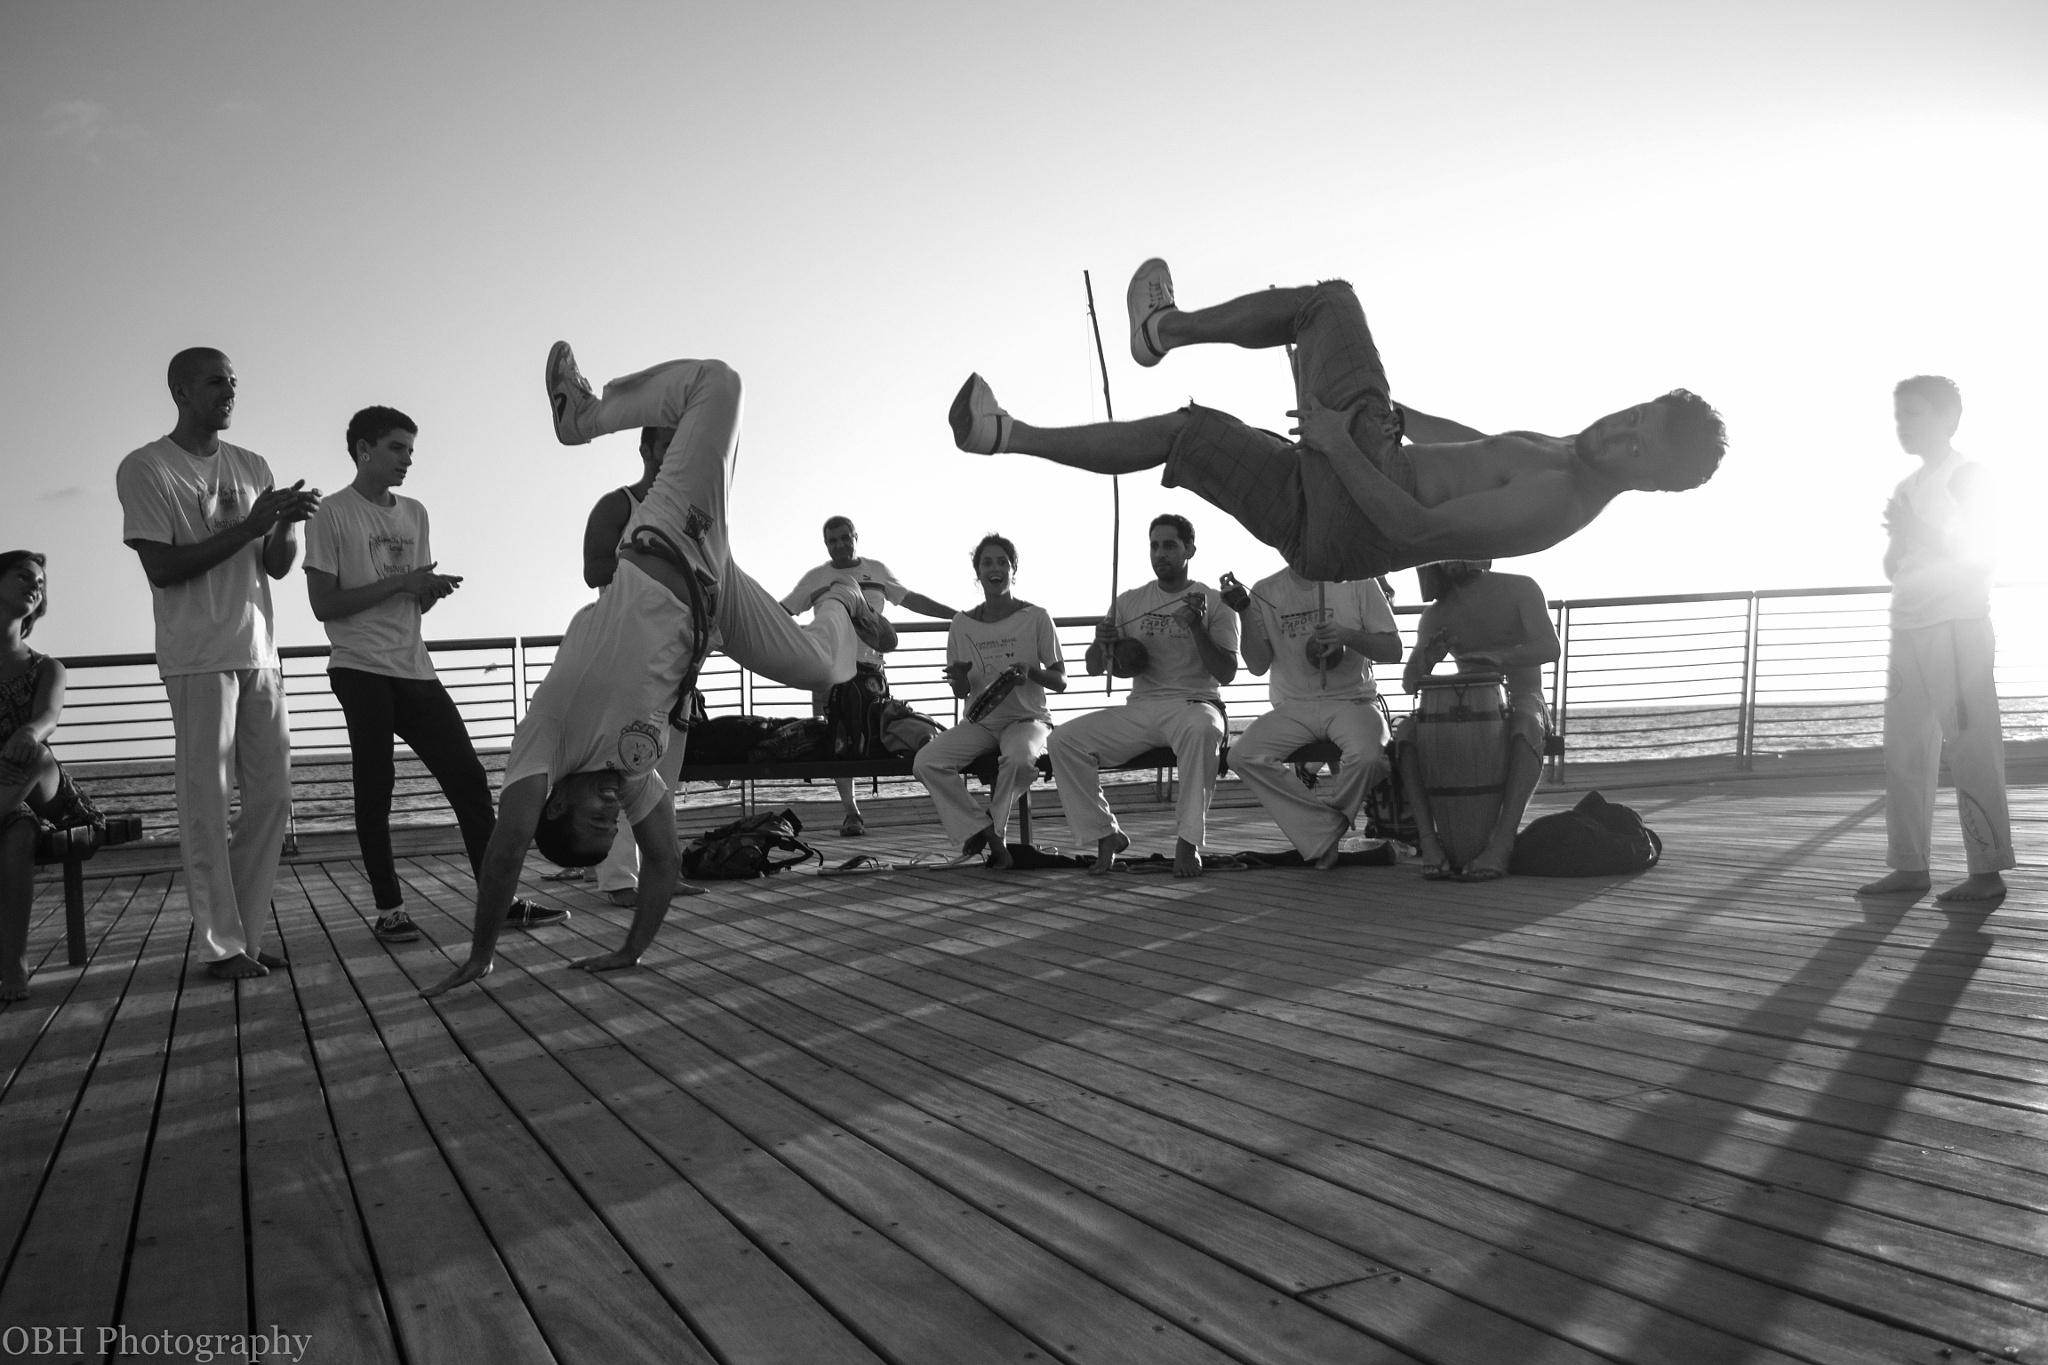 Capoeira by Omer Ben-Haim